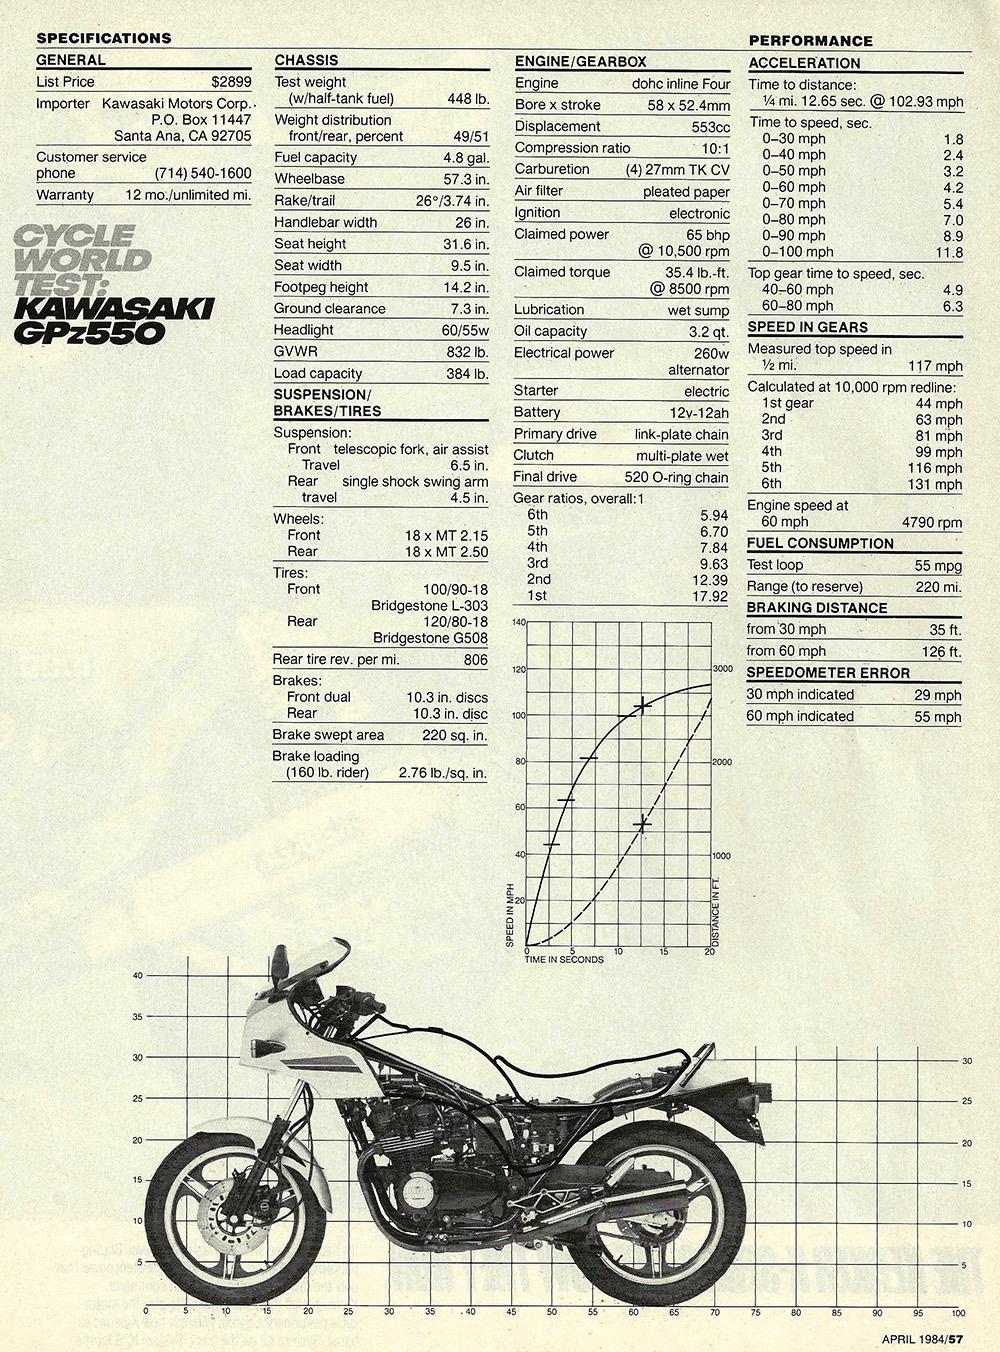 1984 Kawasaki GPz550 road test 06.jpg